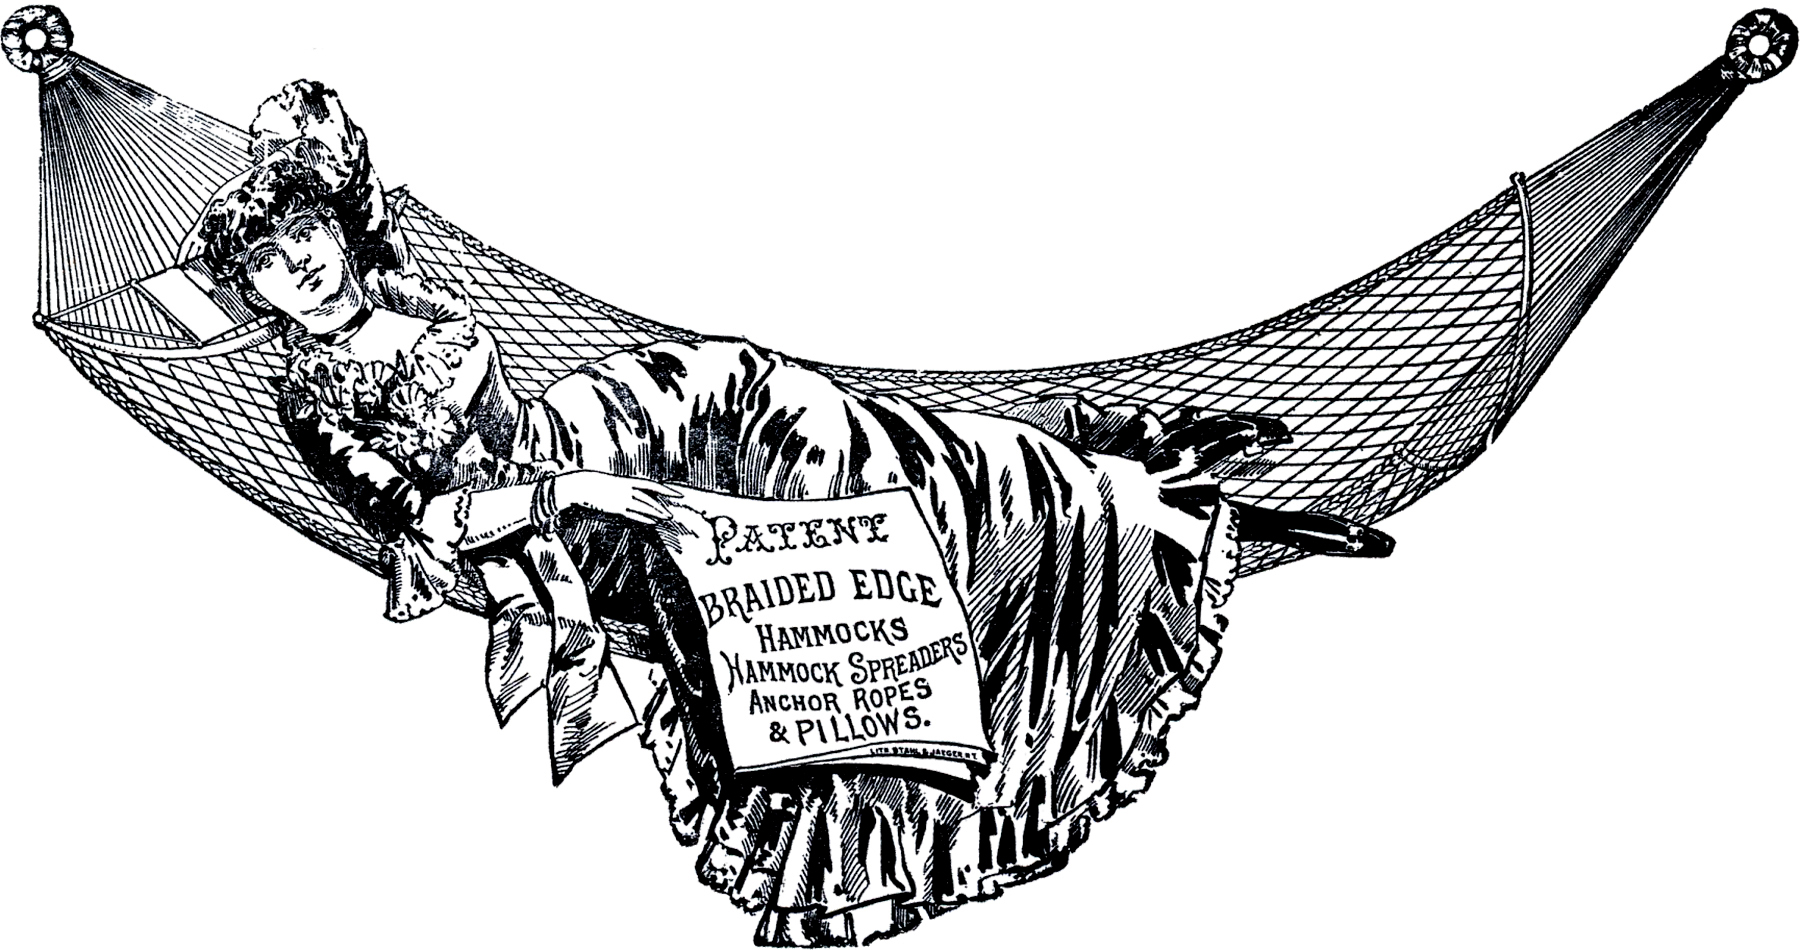 Public Domain Hammock Image - Cute! - The Graphics Fairy